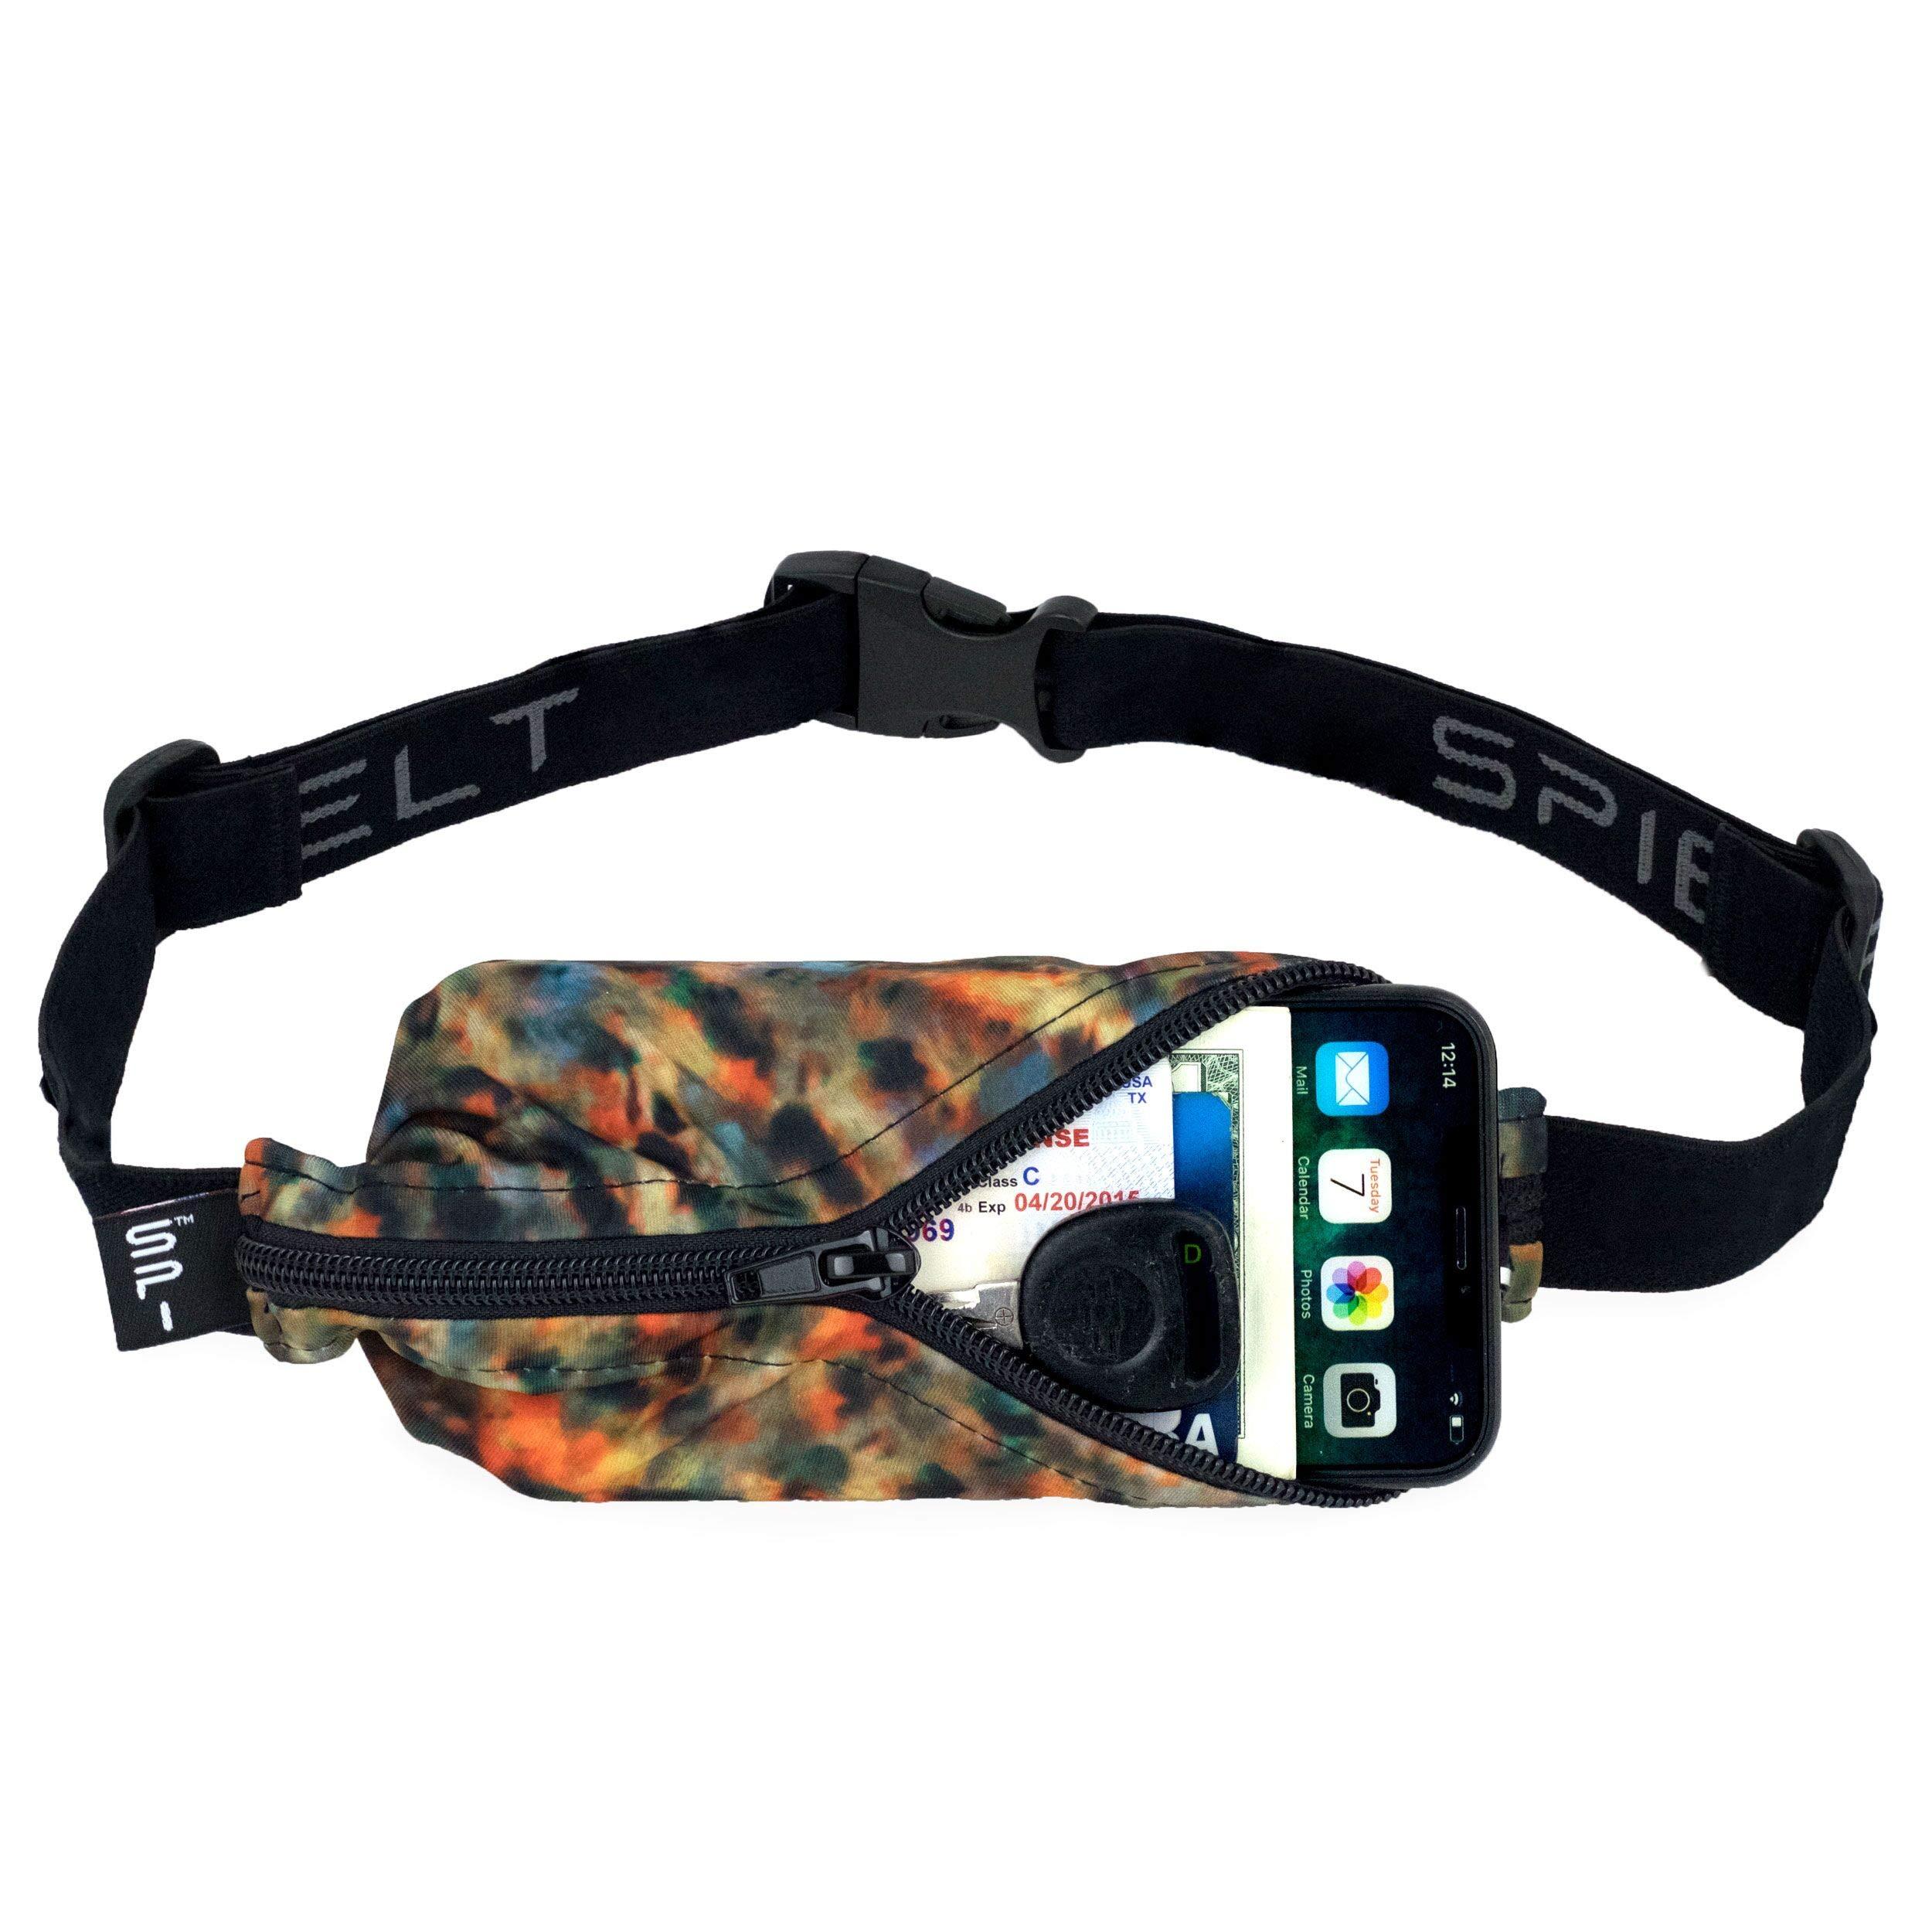 SPIbelt Running Belt: Adult Large Pocket - No-Bounce Running Belt for Runners, Athletes and Adventurers (Tiger's Eye with Black Zipper, 25'' Through 47'') by SPIbelt